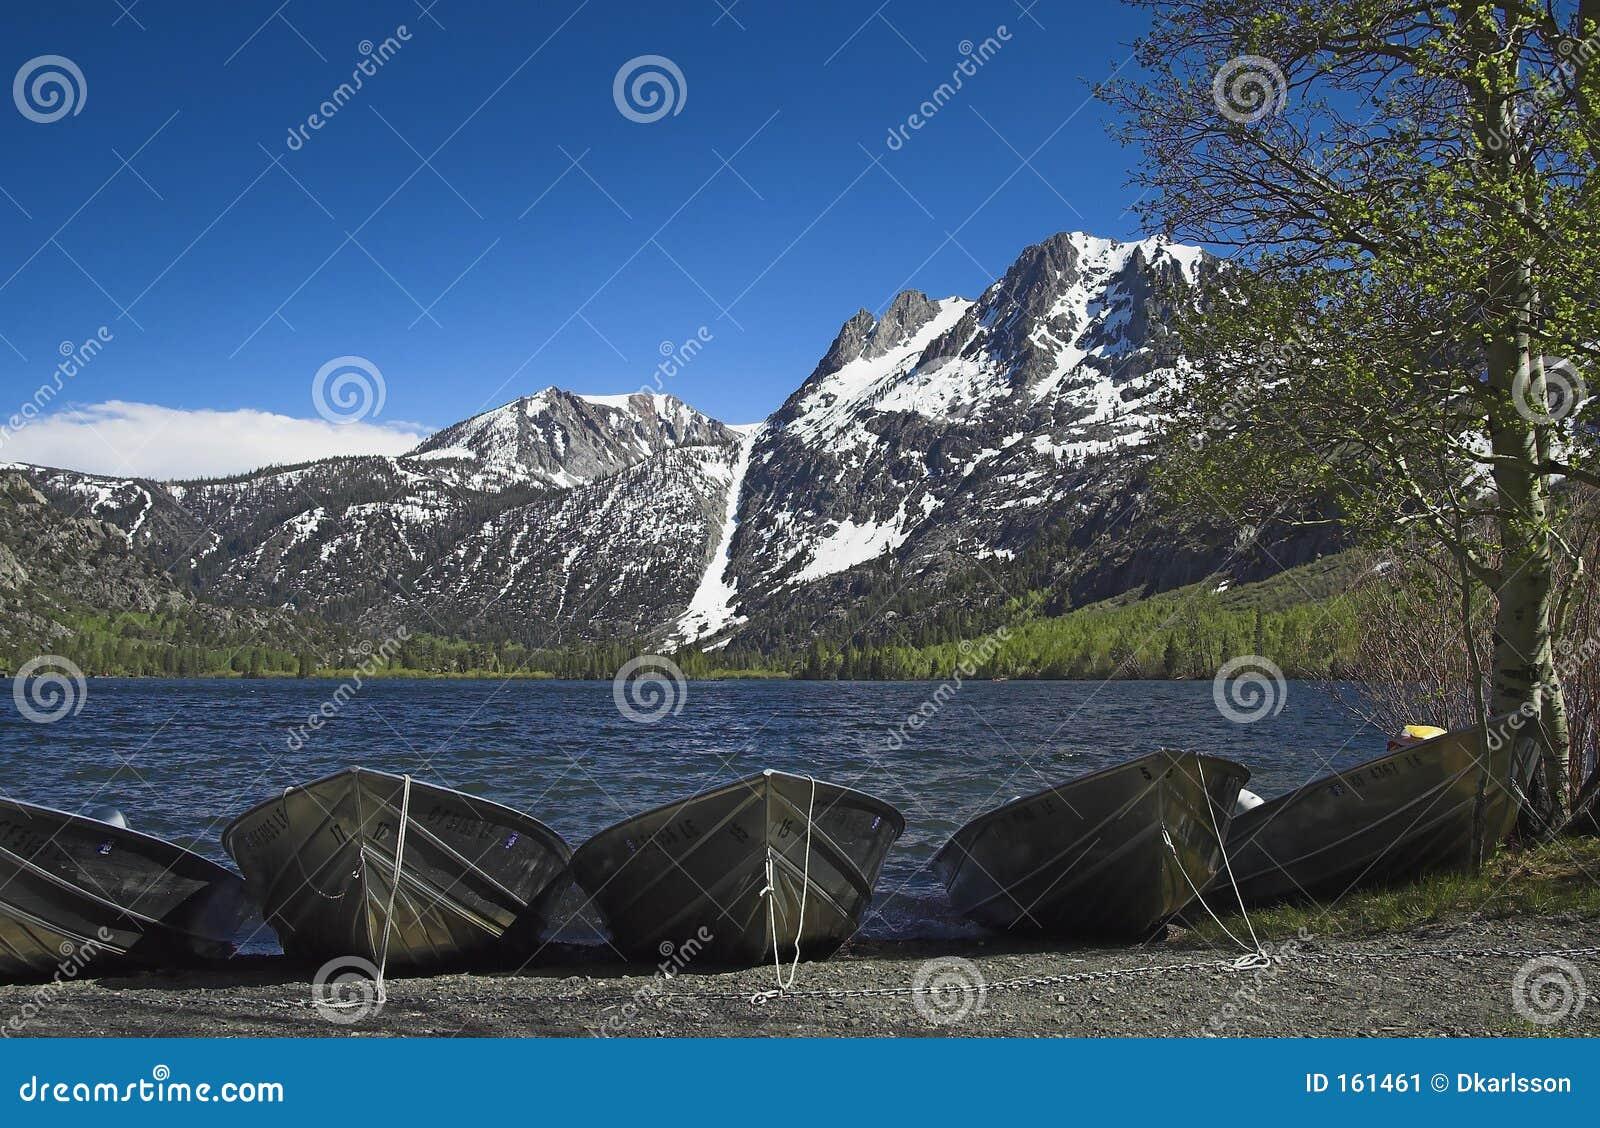 Boats on Silver Lake